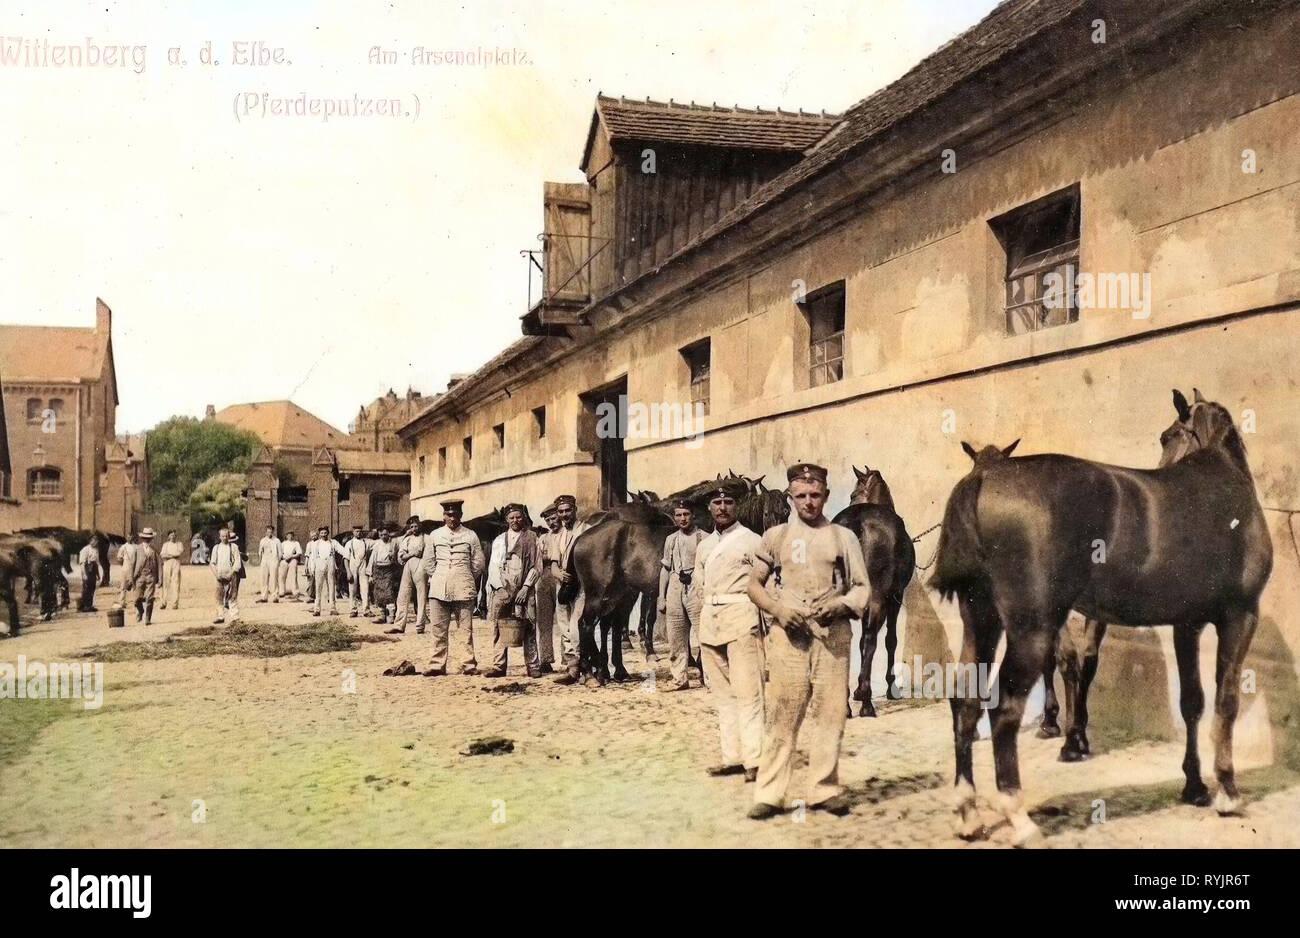 Arsenals in Germany, Military facilities of Germany, Military use of horses, Military in Germany, Streets in Wittenberg, 1911, Saxony-Anhalt, Wittenberg, Am Arsenalplatz - Stock Image